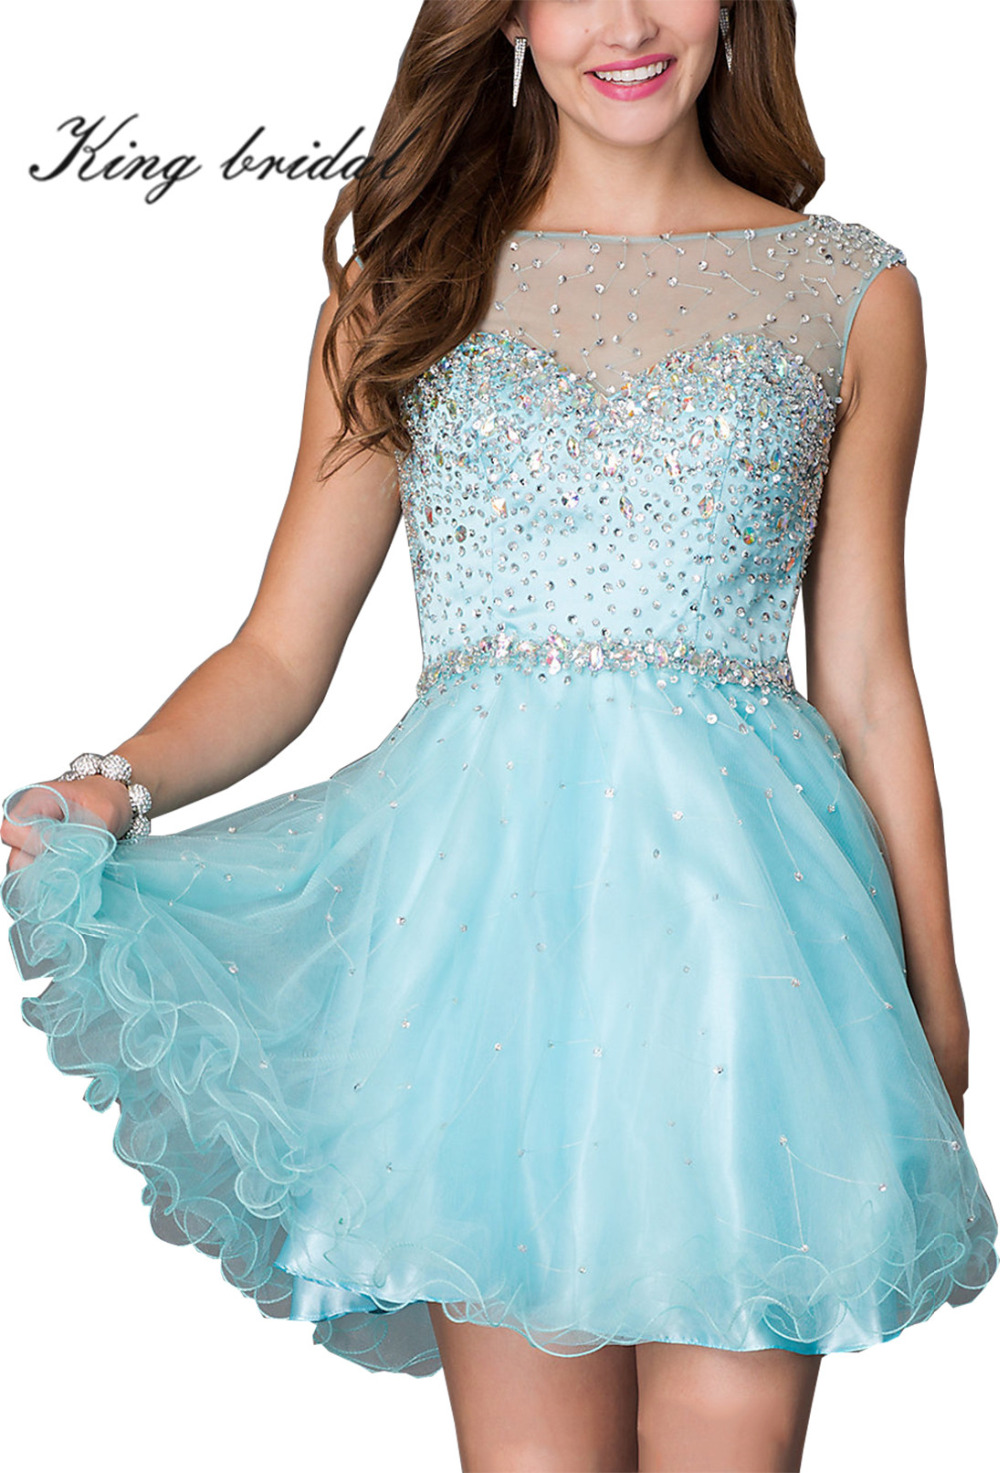 Enchanting Cheap Black Party Dress Festooning - All Wedding Dresses ...